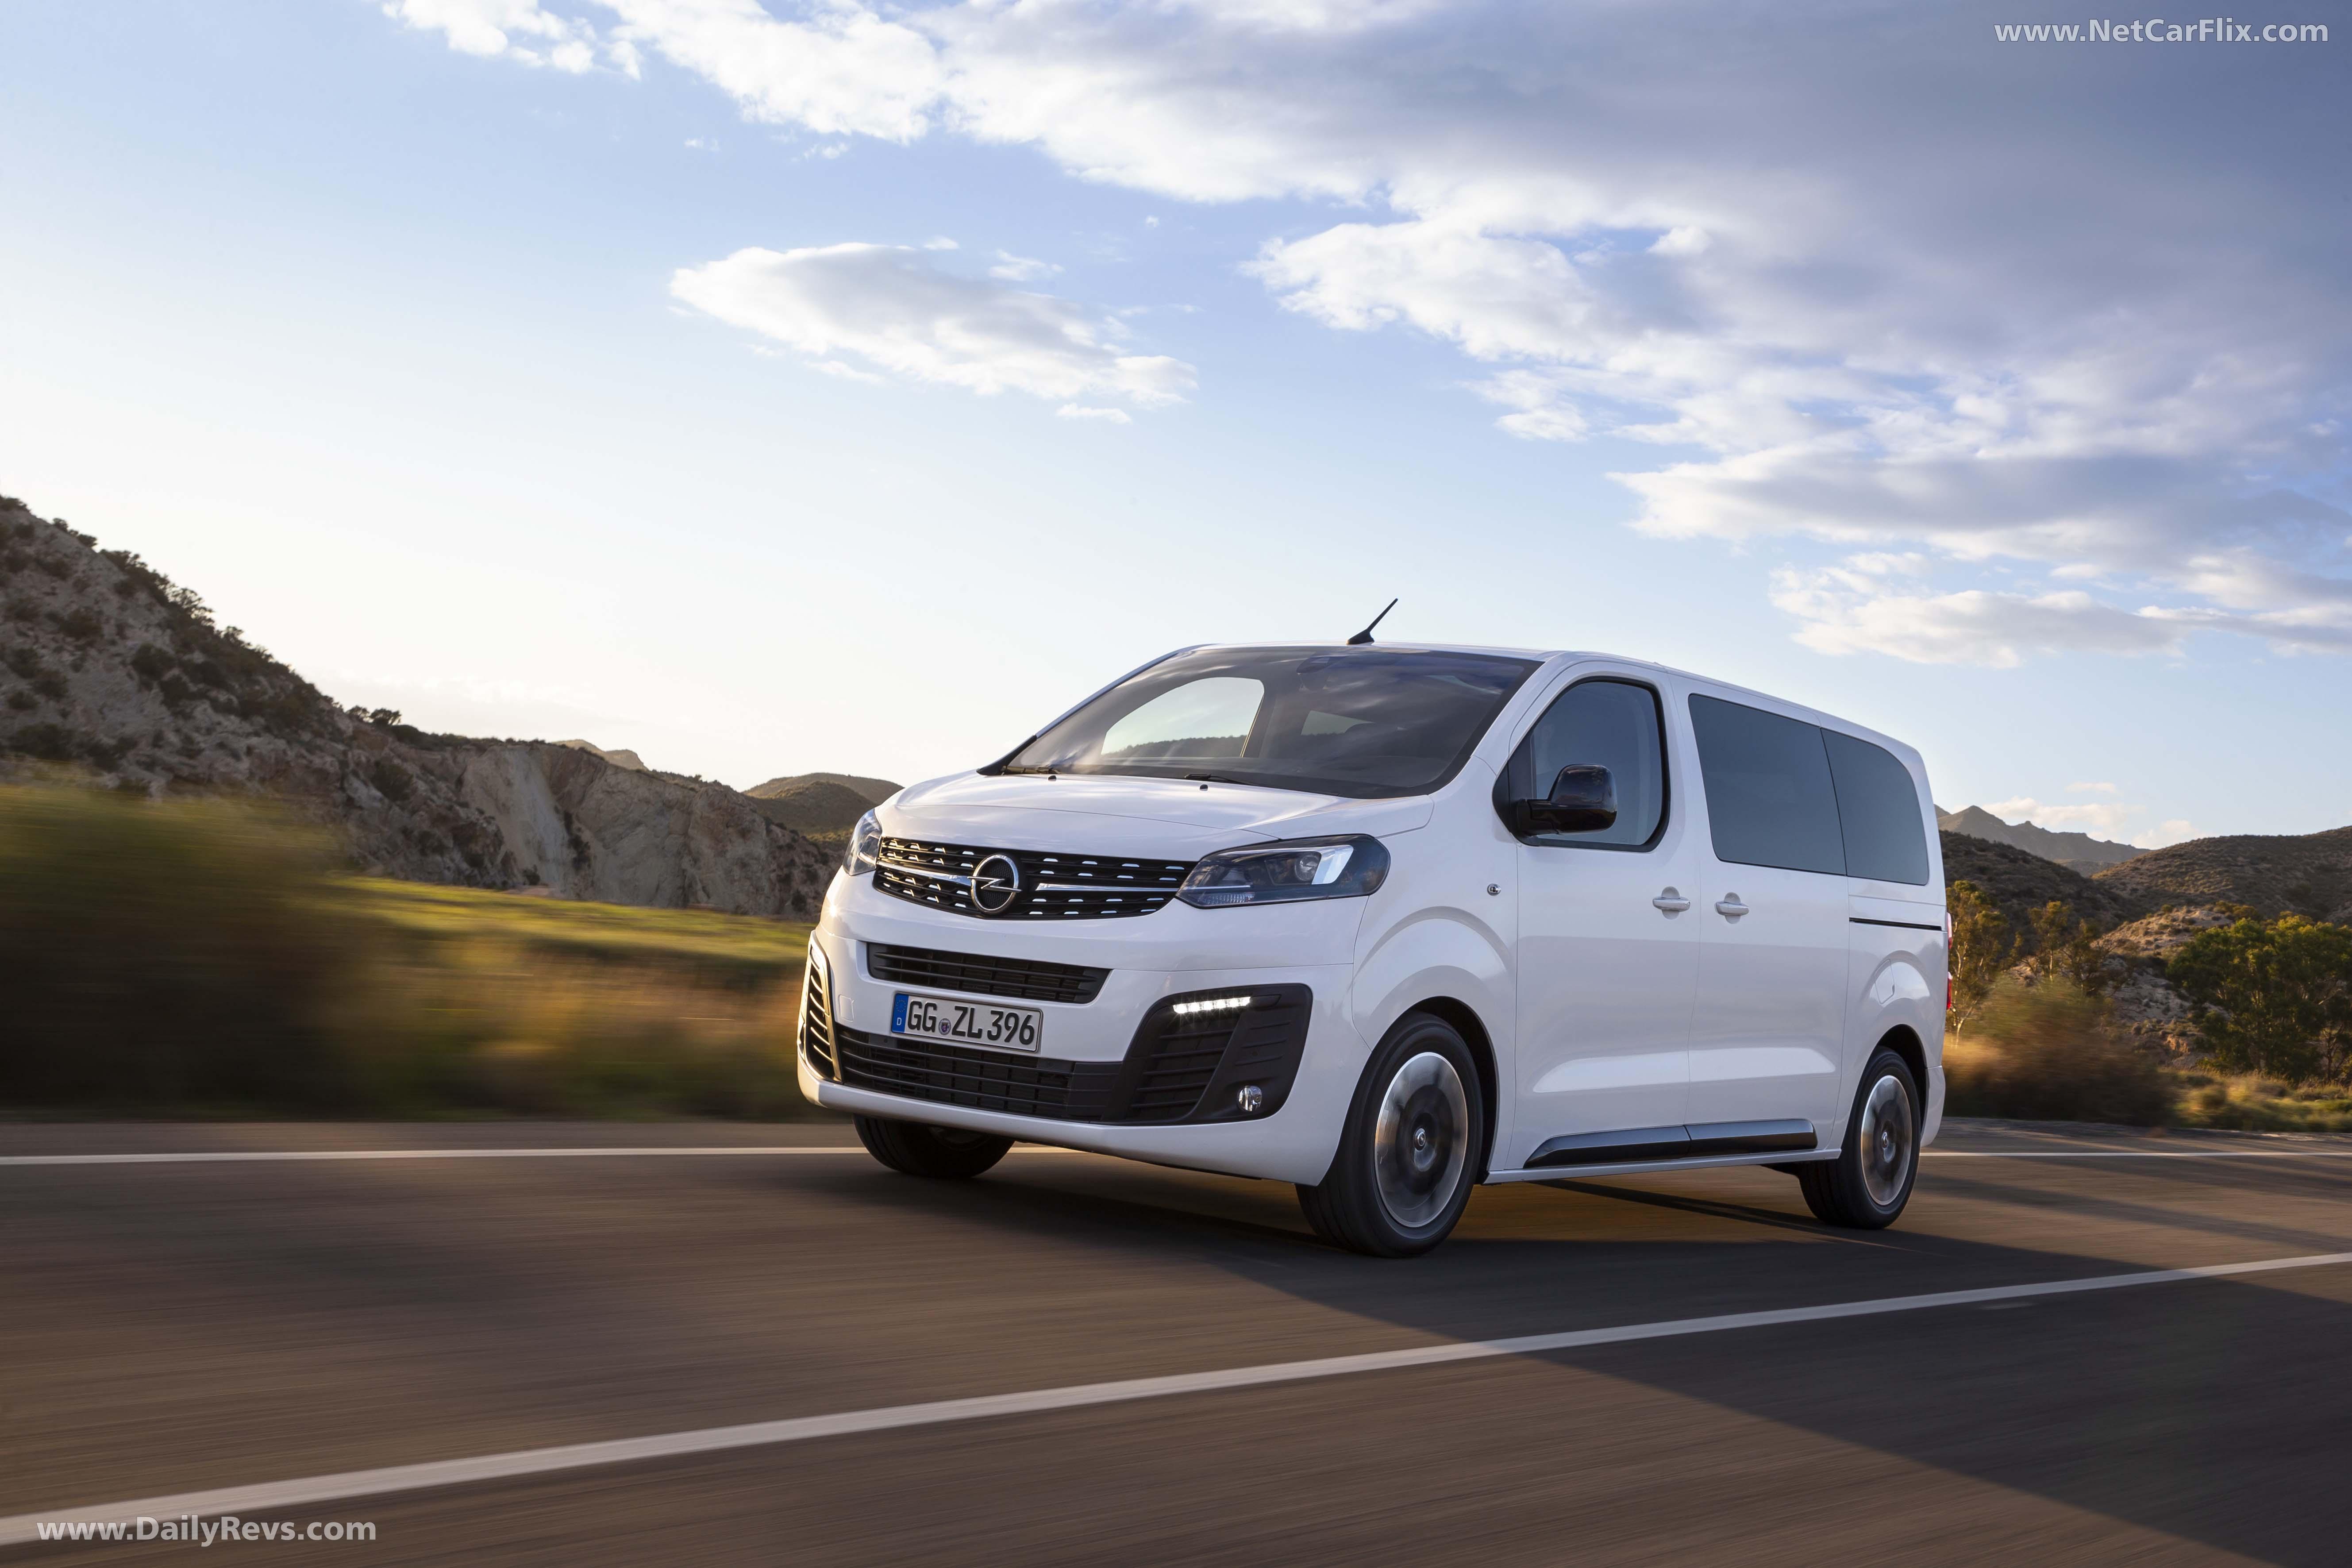 2020 Opel Zafira Life full